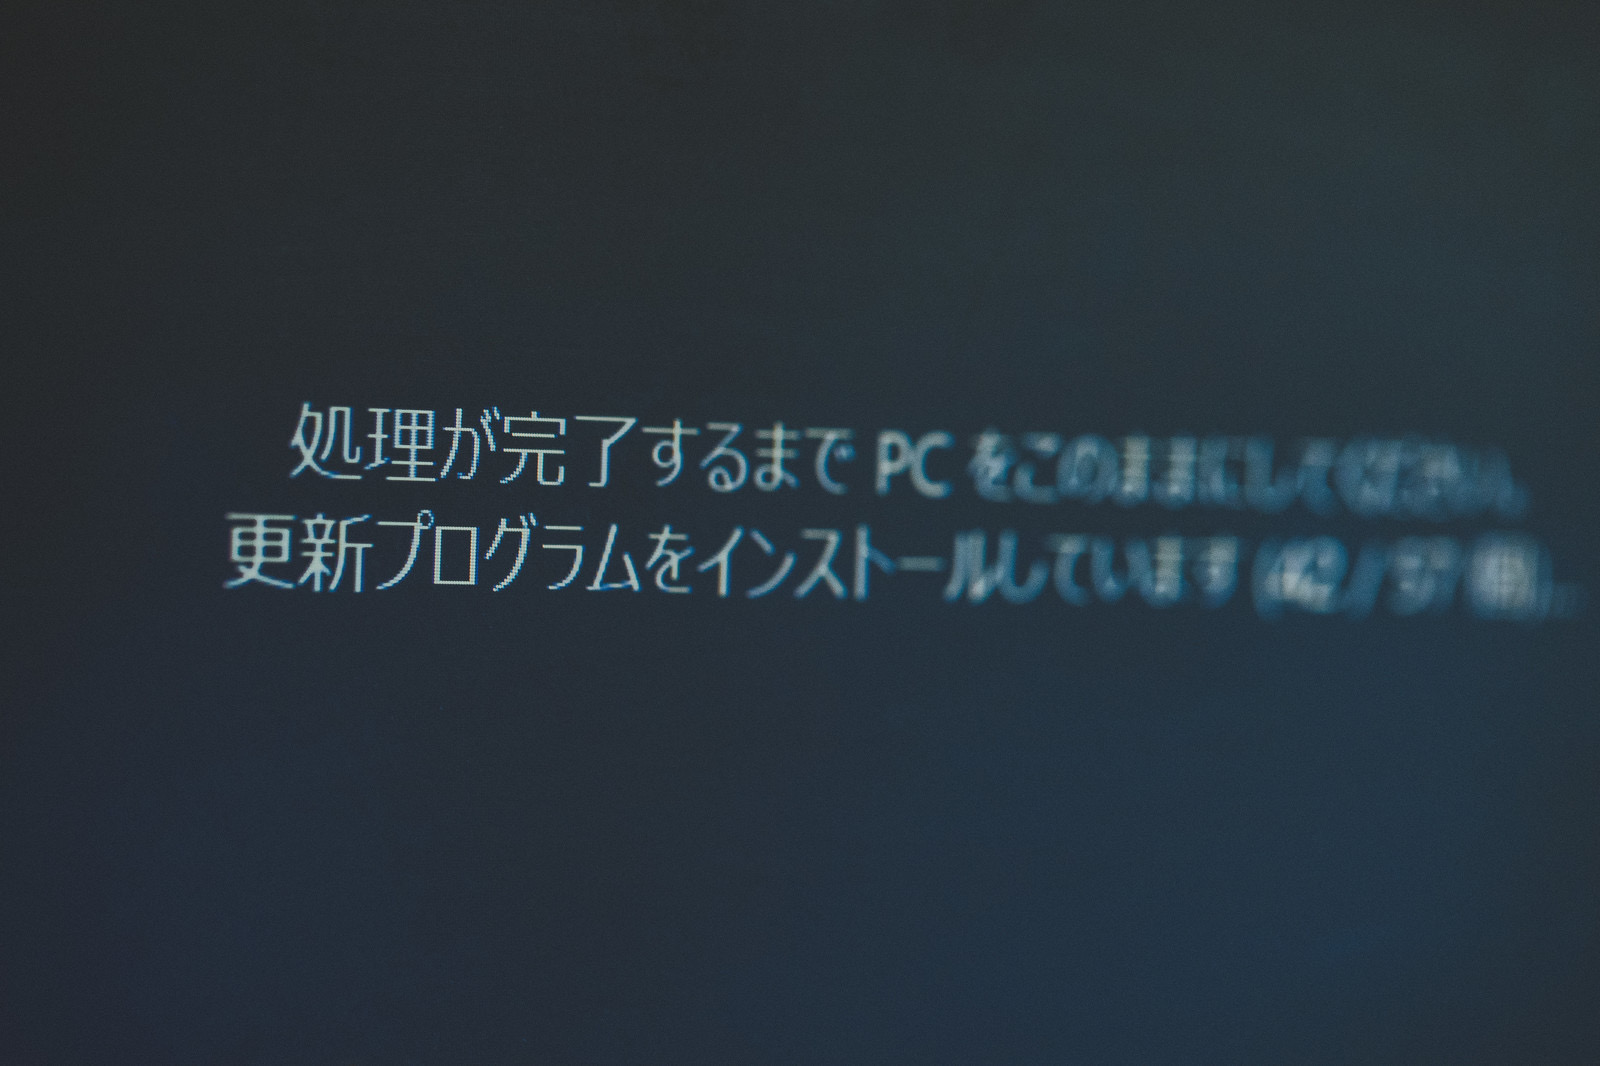 WindowsIMGL1807 TP V